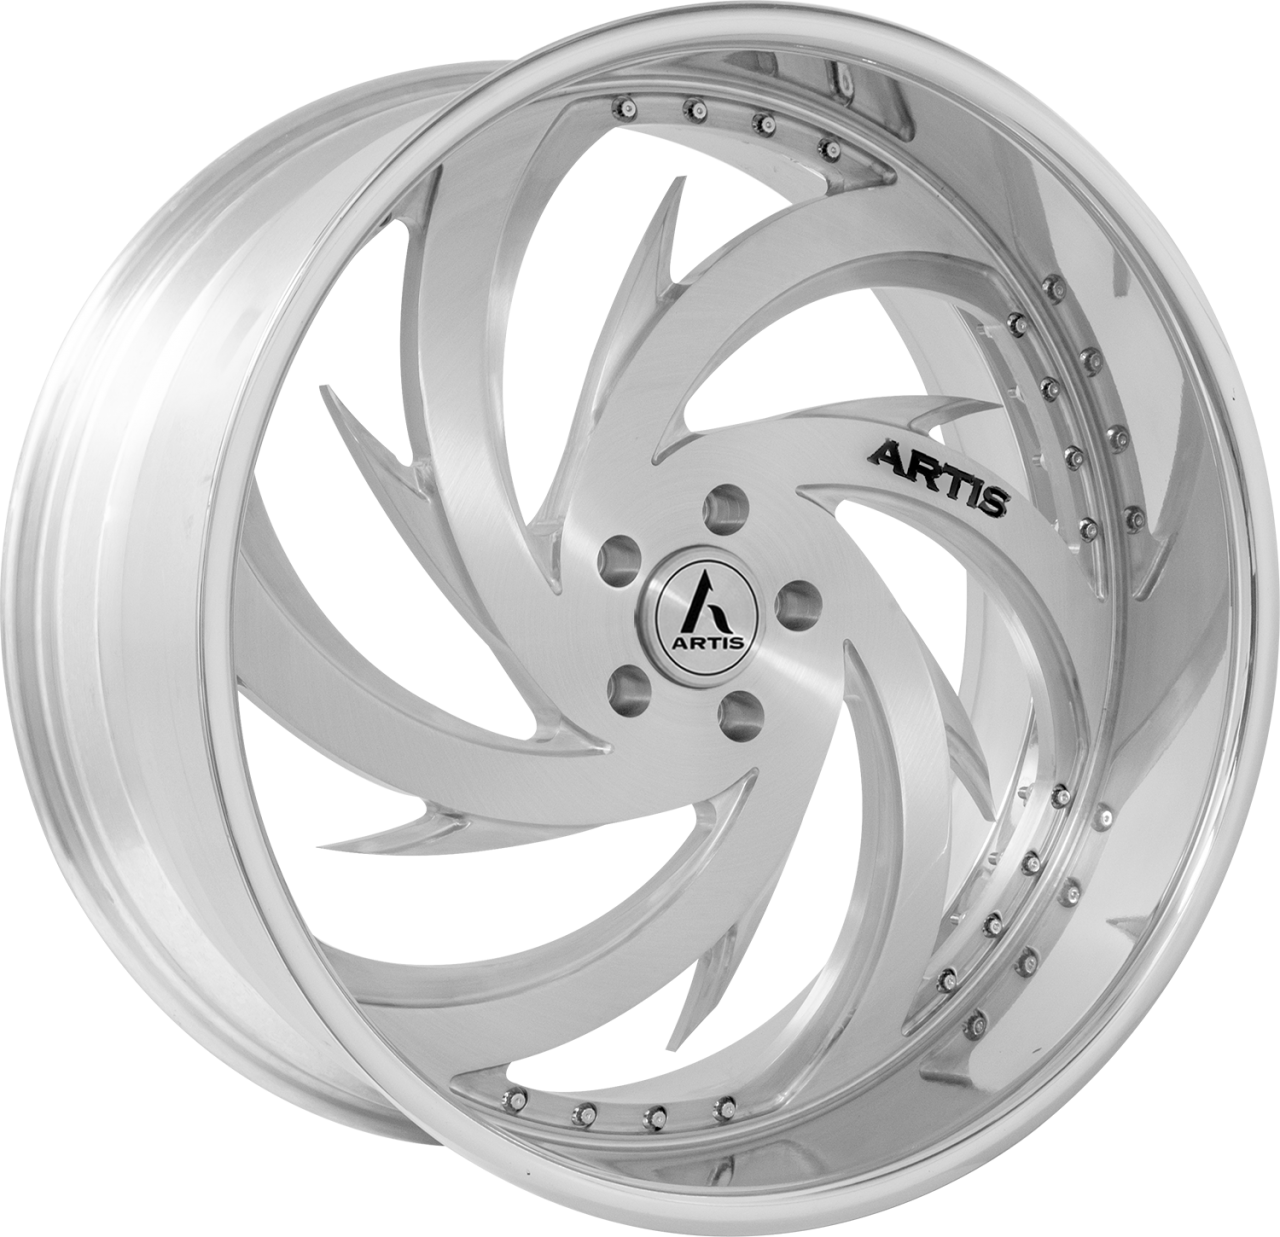 Artis Forged Spada-M wheel with Brushed finish